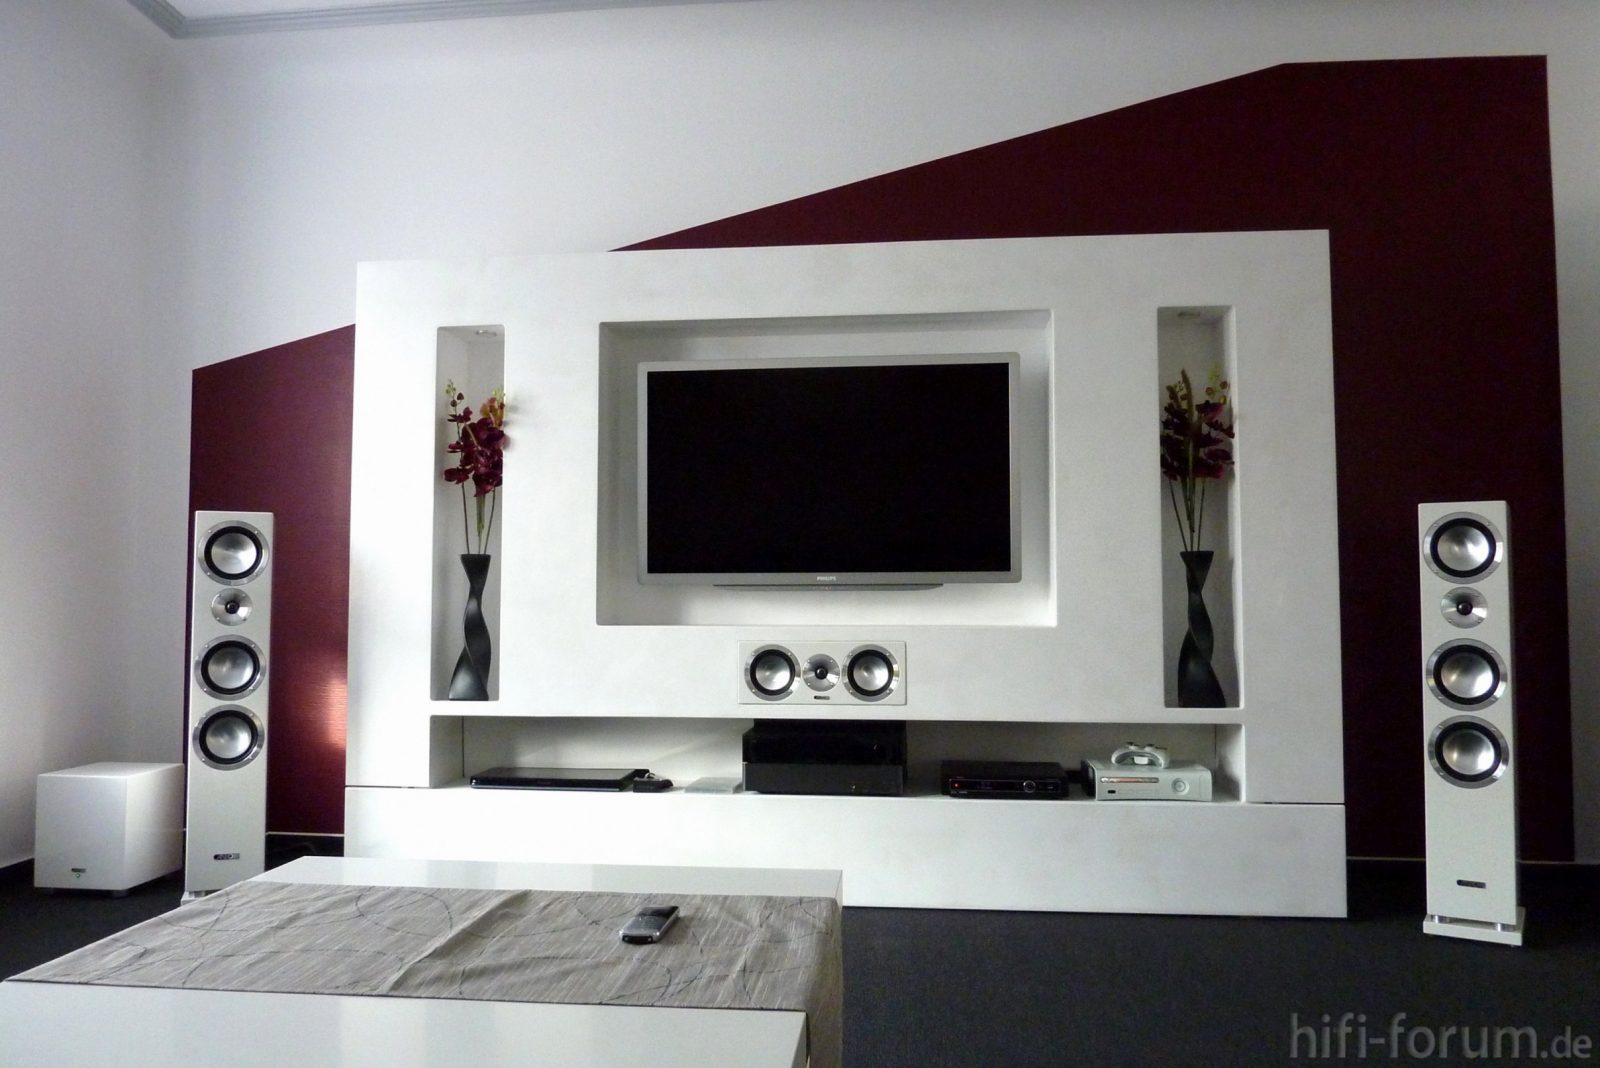 35 Moderne Tv Wand Selber Bauen Laminat  Ahhadesigns von Hifi Wand Selber Bauen Photo